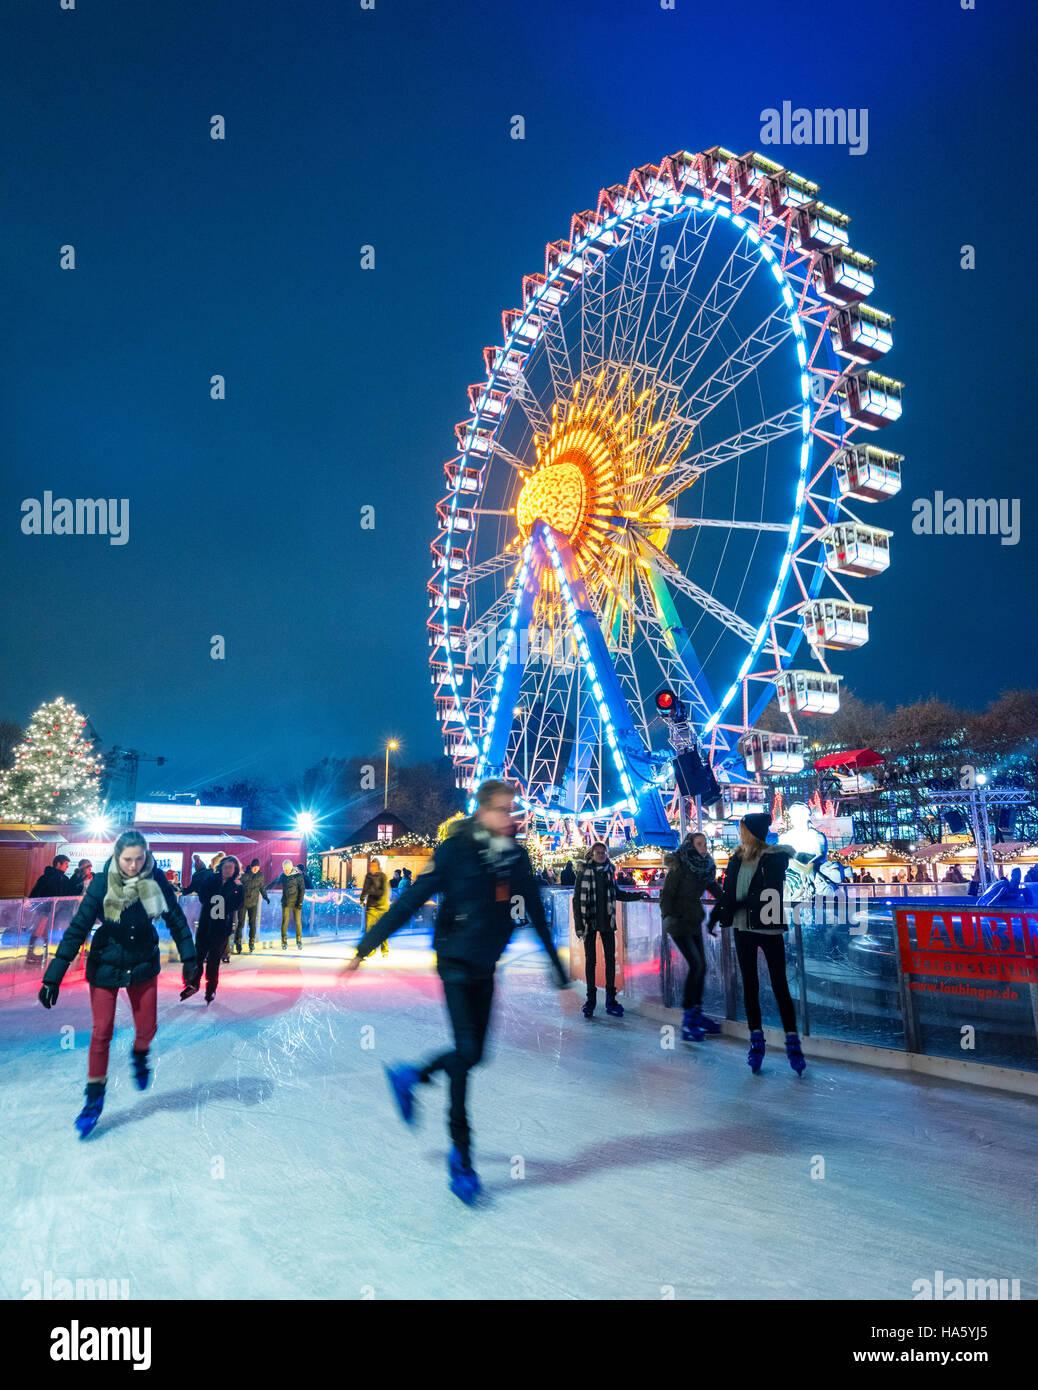 Schlittschuhlaufen Berlin Weihnachtsmarkt.Ice Skating Christmas Market Stockfotos Ice Skating Christmas